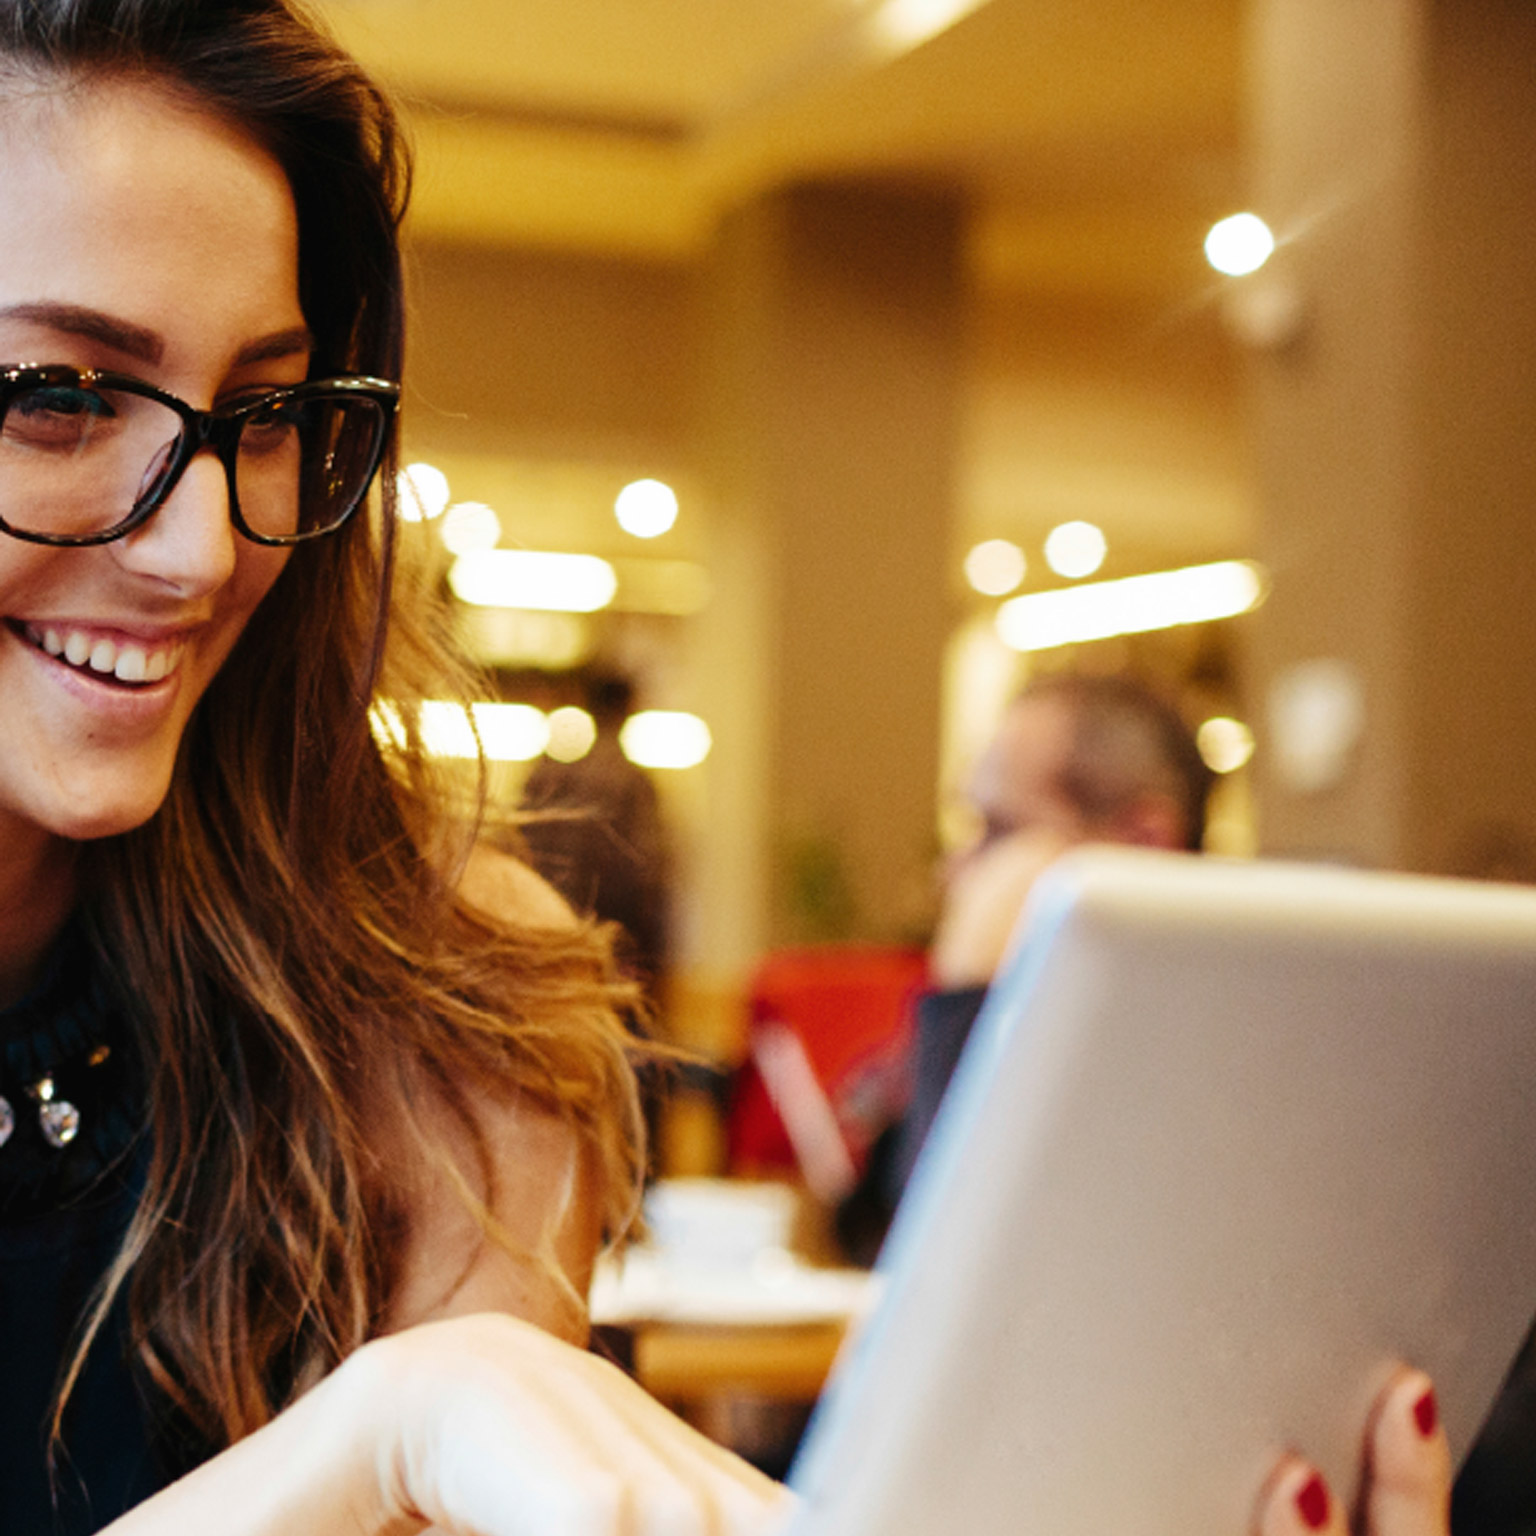 5f994a7f2ec00 The opportunity in online luxury fashion | McKinsey